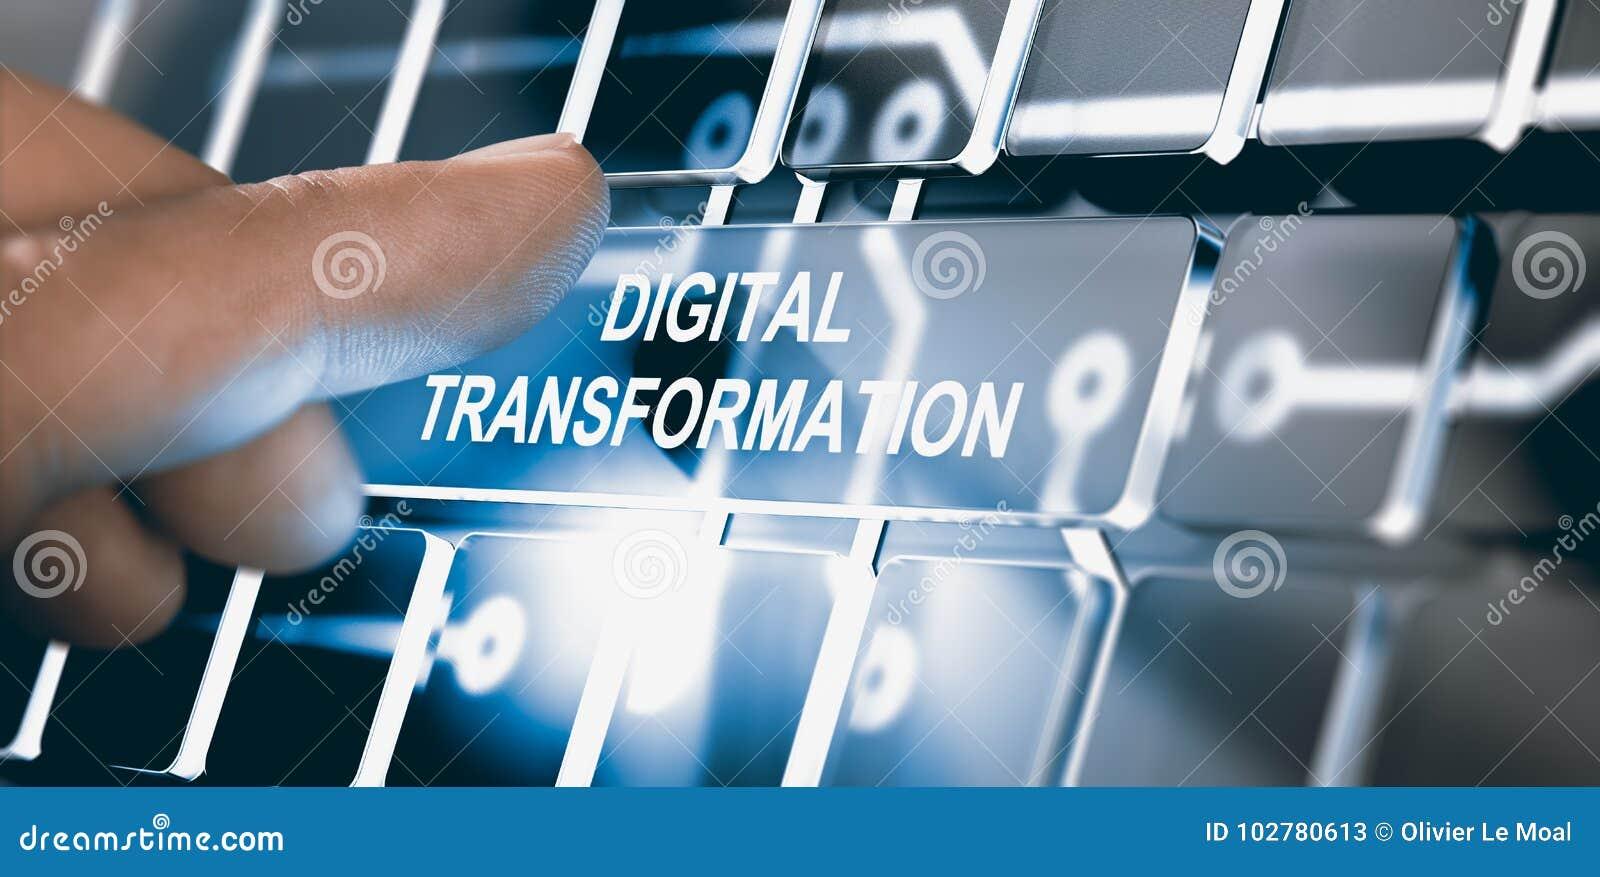 Дигитализирование, концепция преобразования цифров